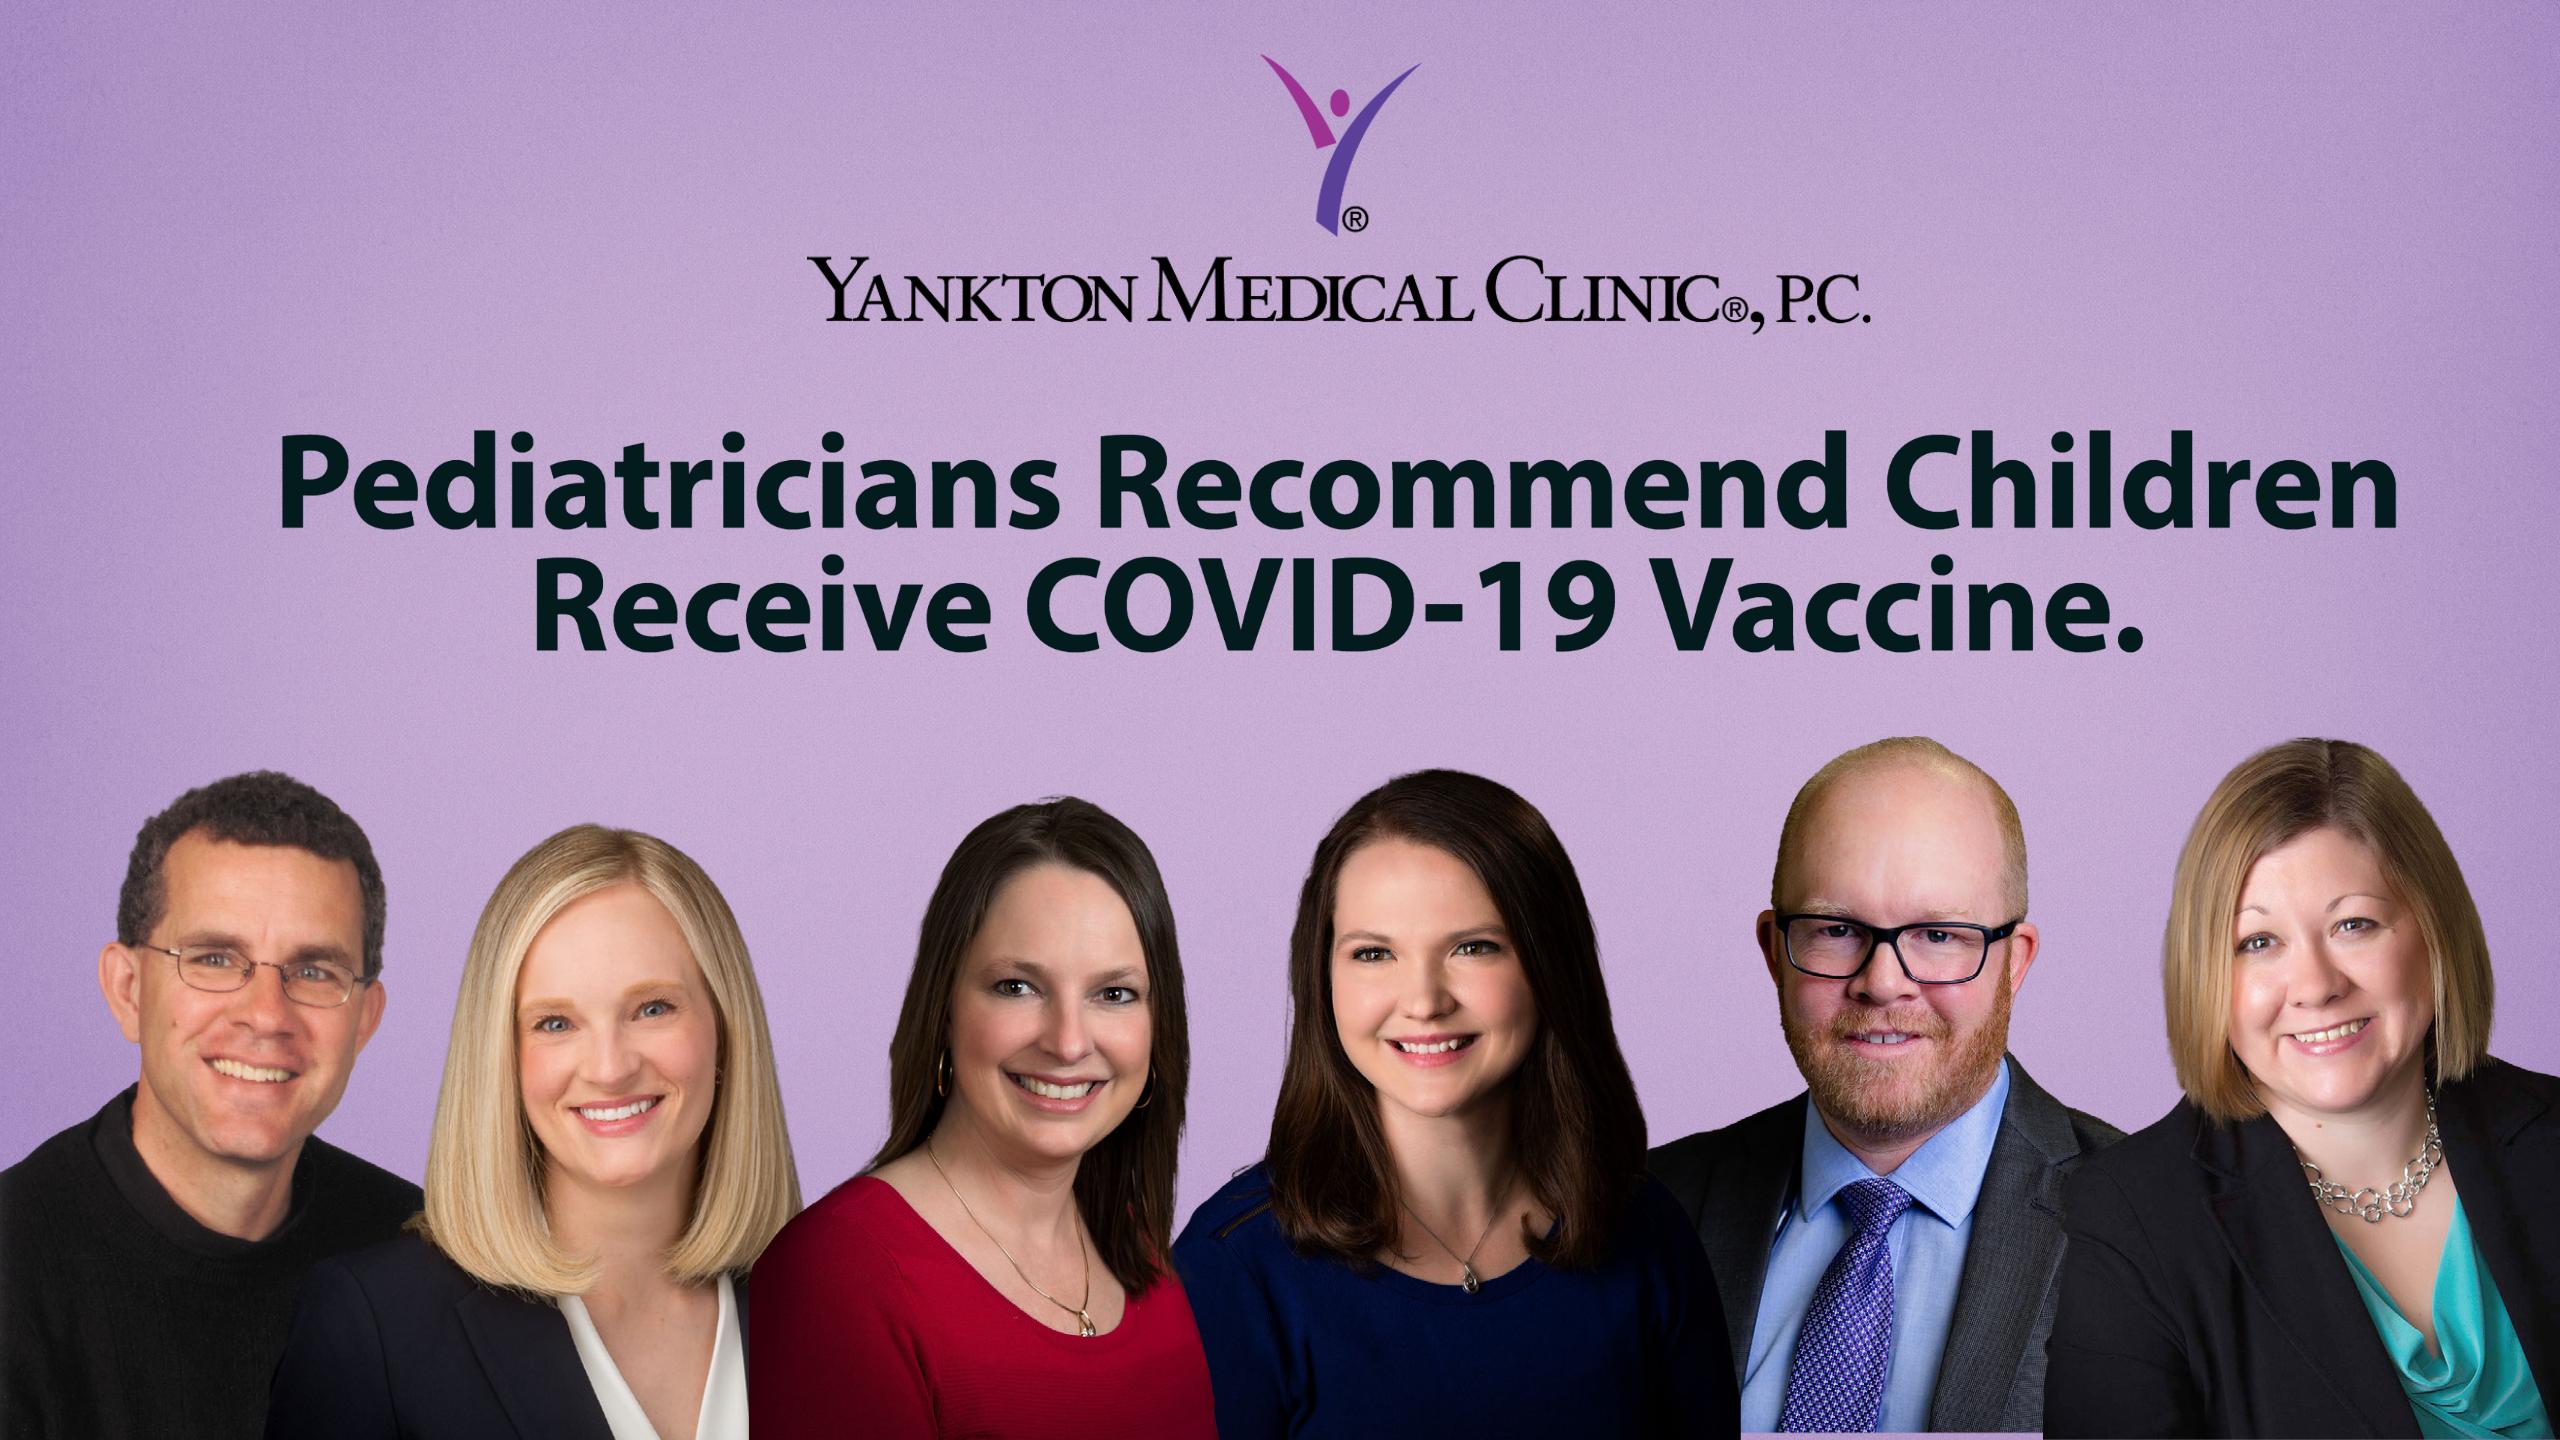 Yankton Medical Clinic. P.C. Pediatricians  Recommend COVID-19 Vaccinations for Children